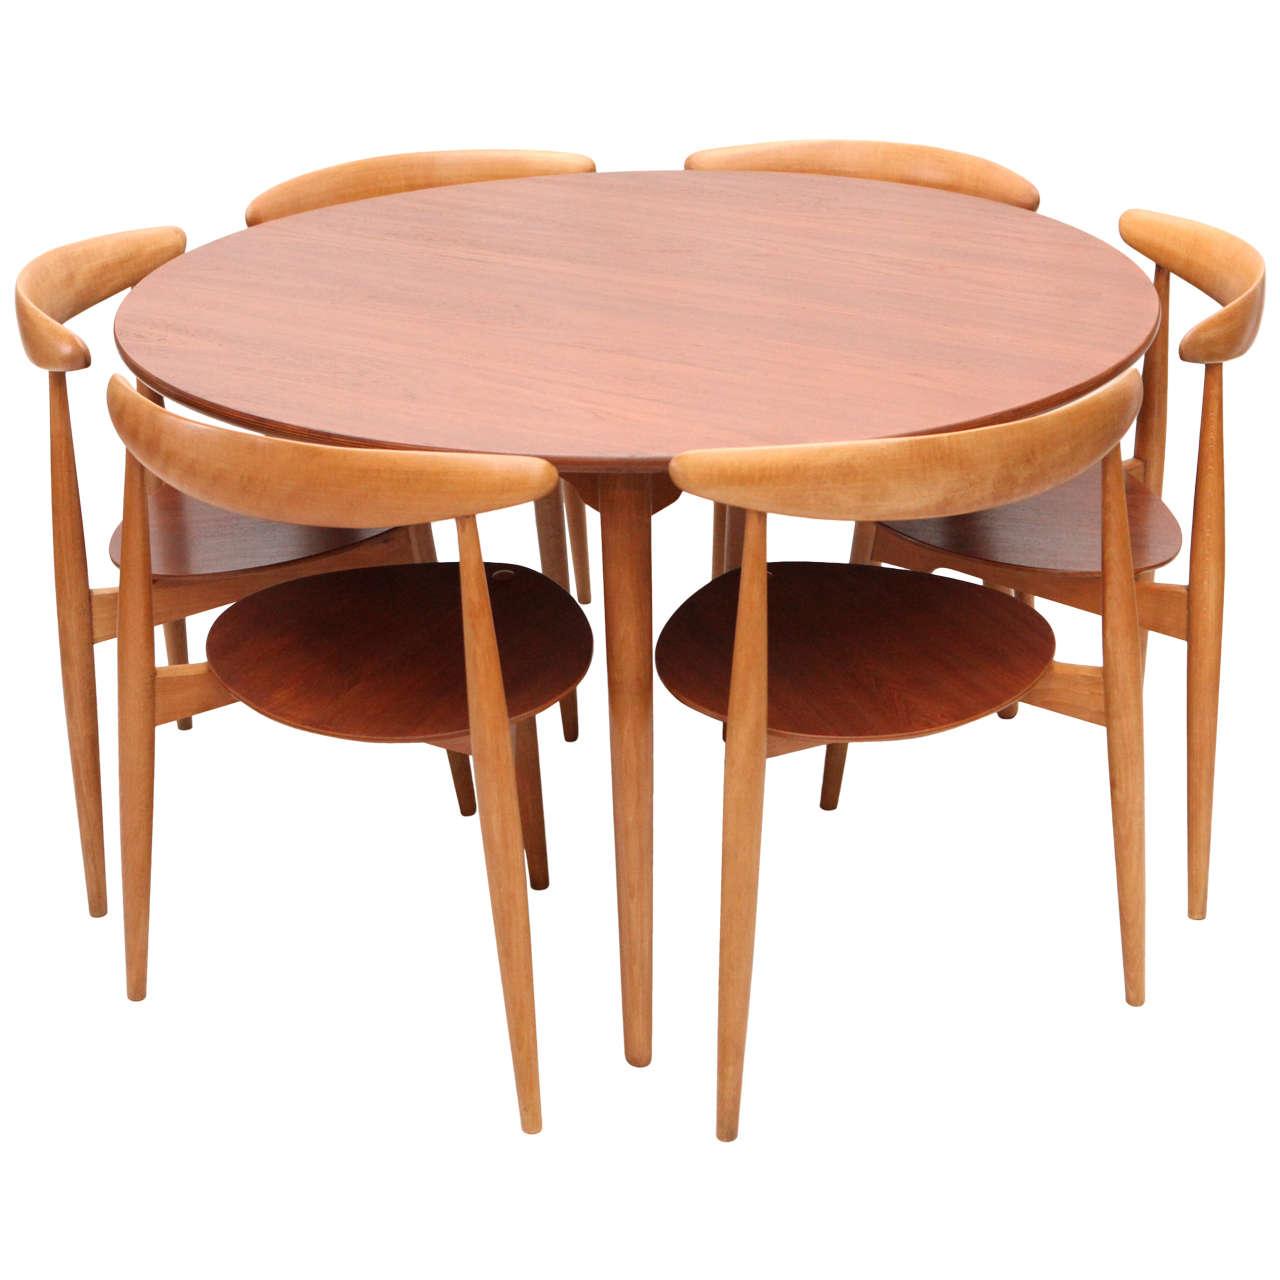 Three Leg Table Hans Wegner With Matching Chairs At 1stdibs